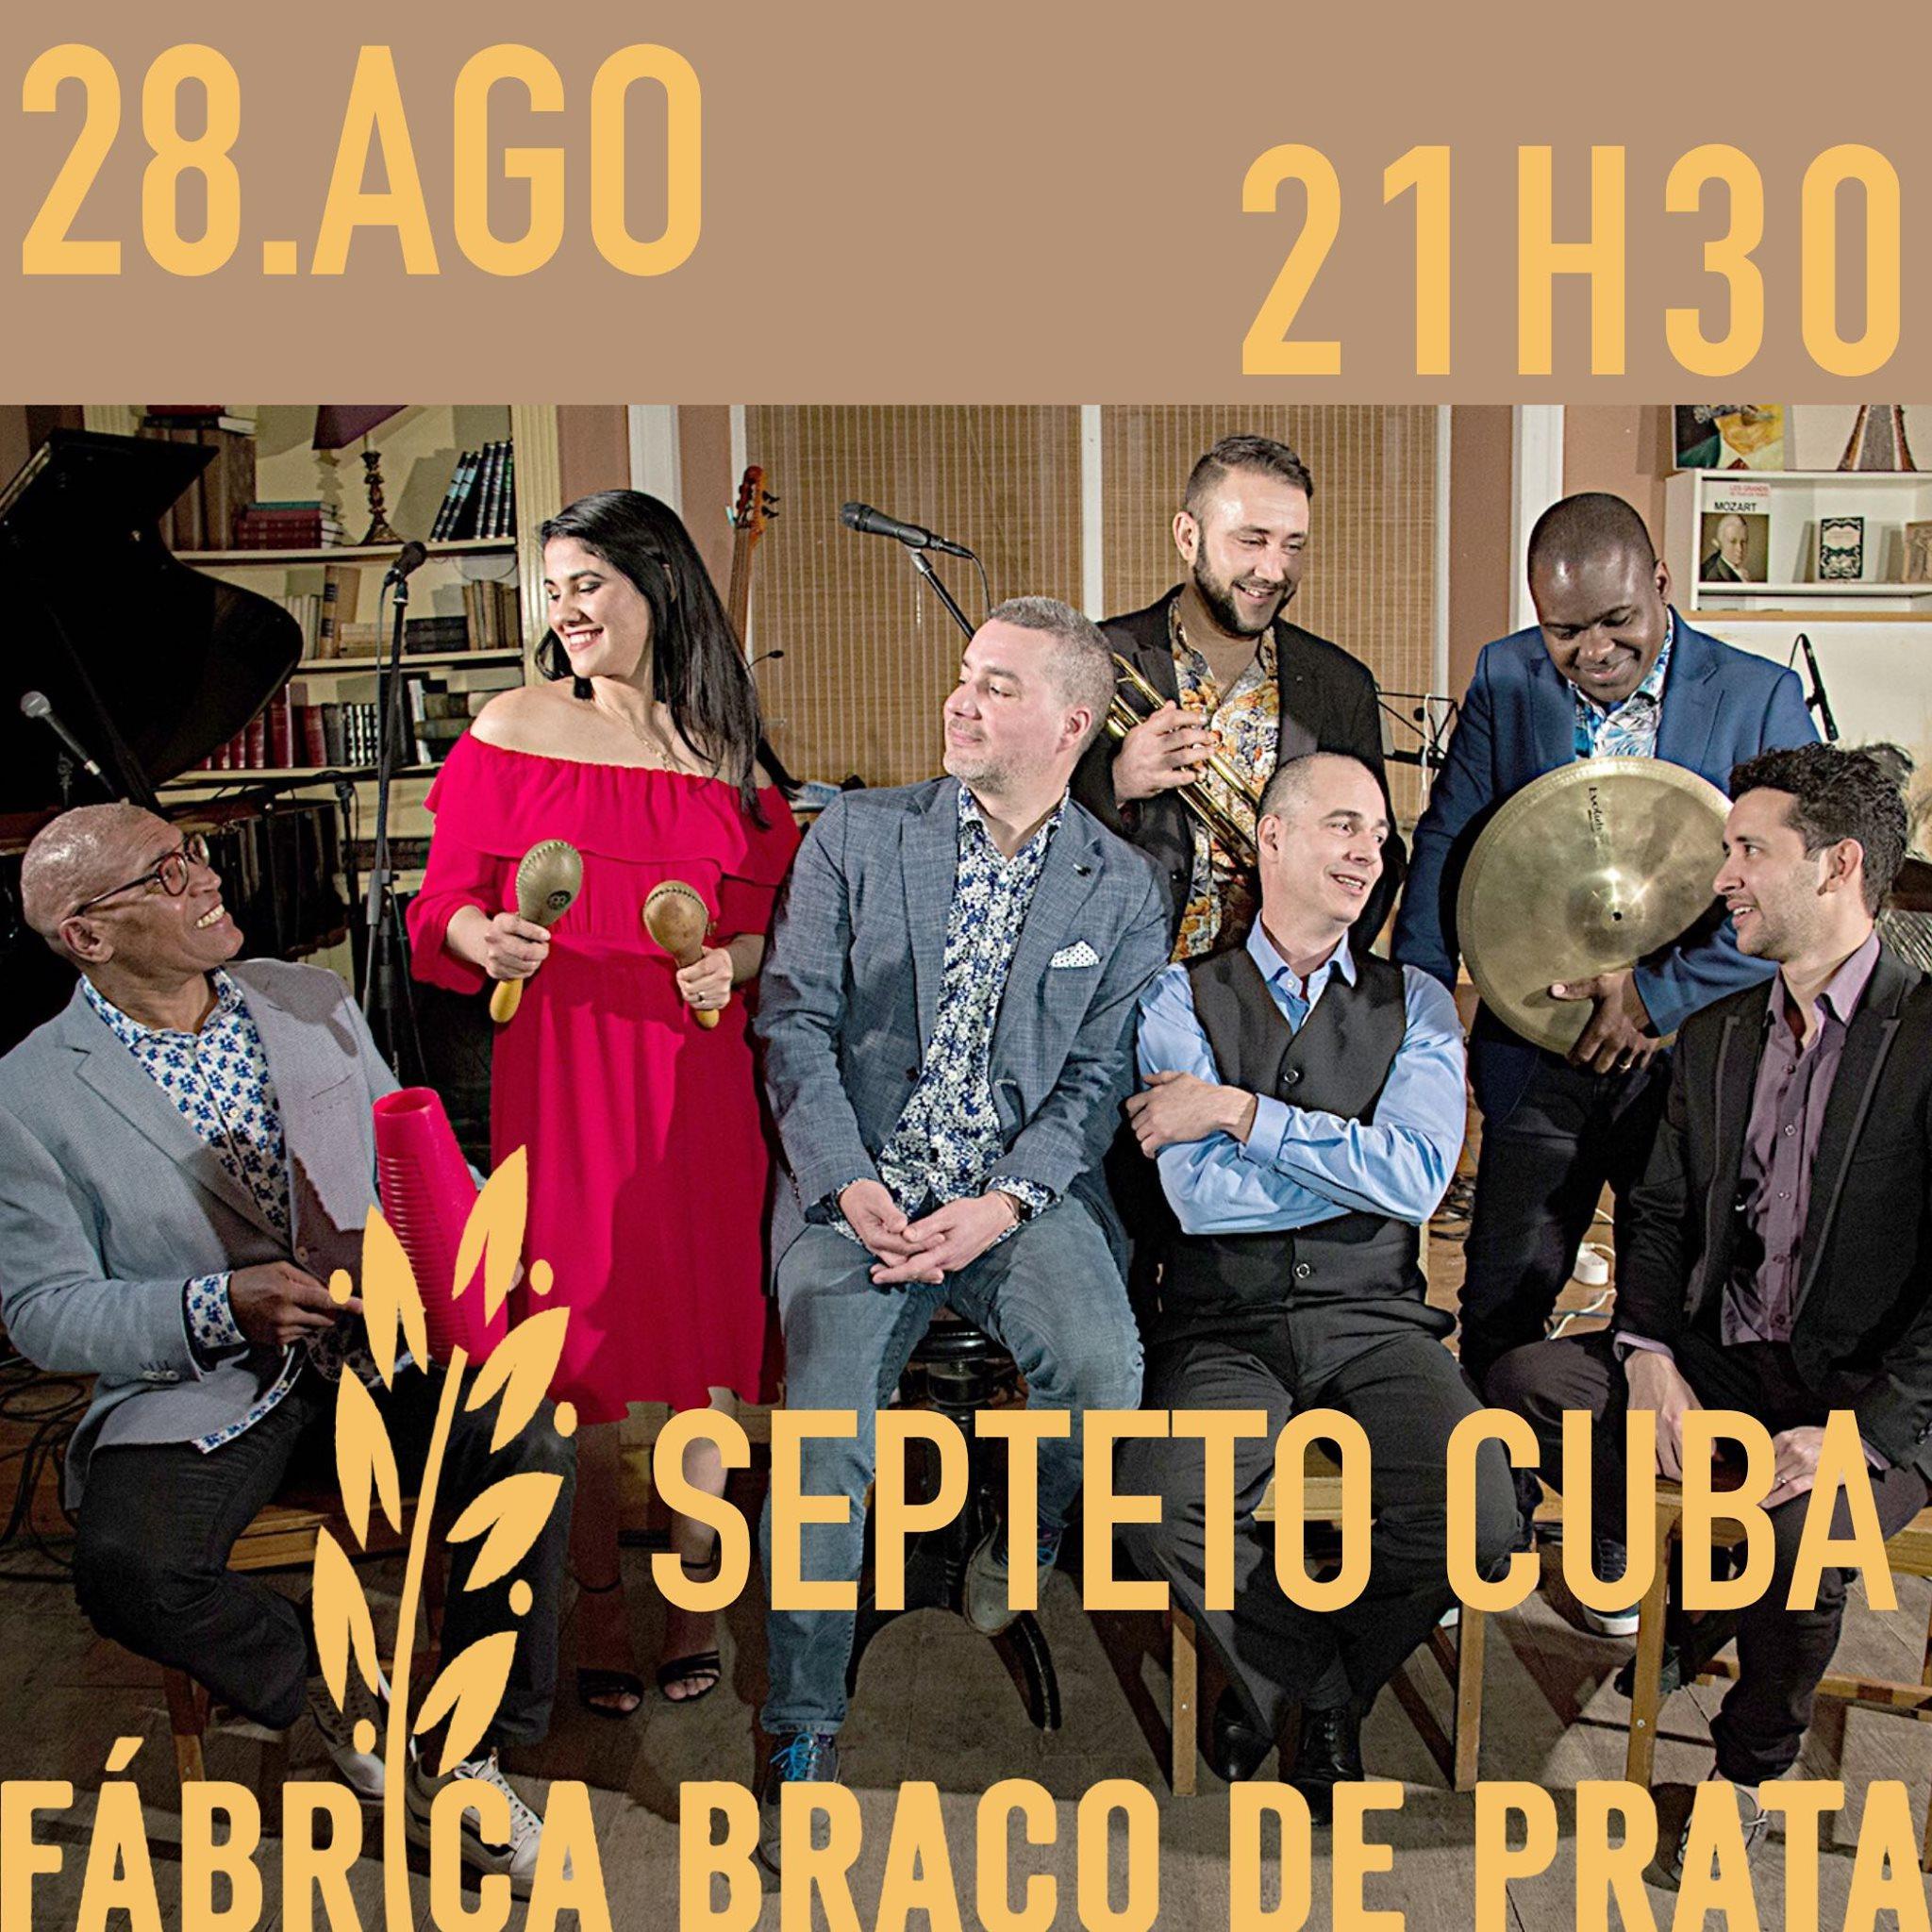 Esplanada | Septeto Cuba